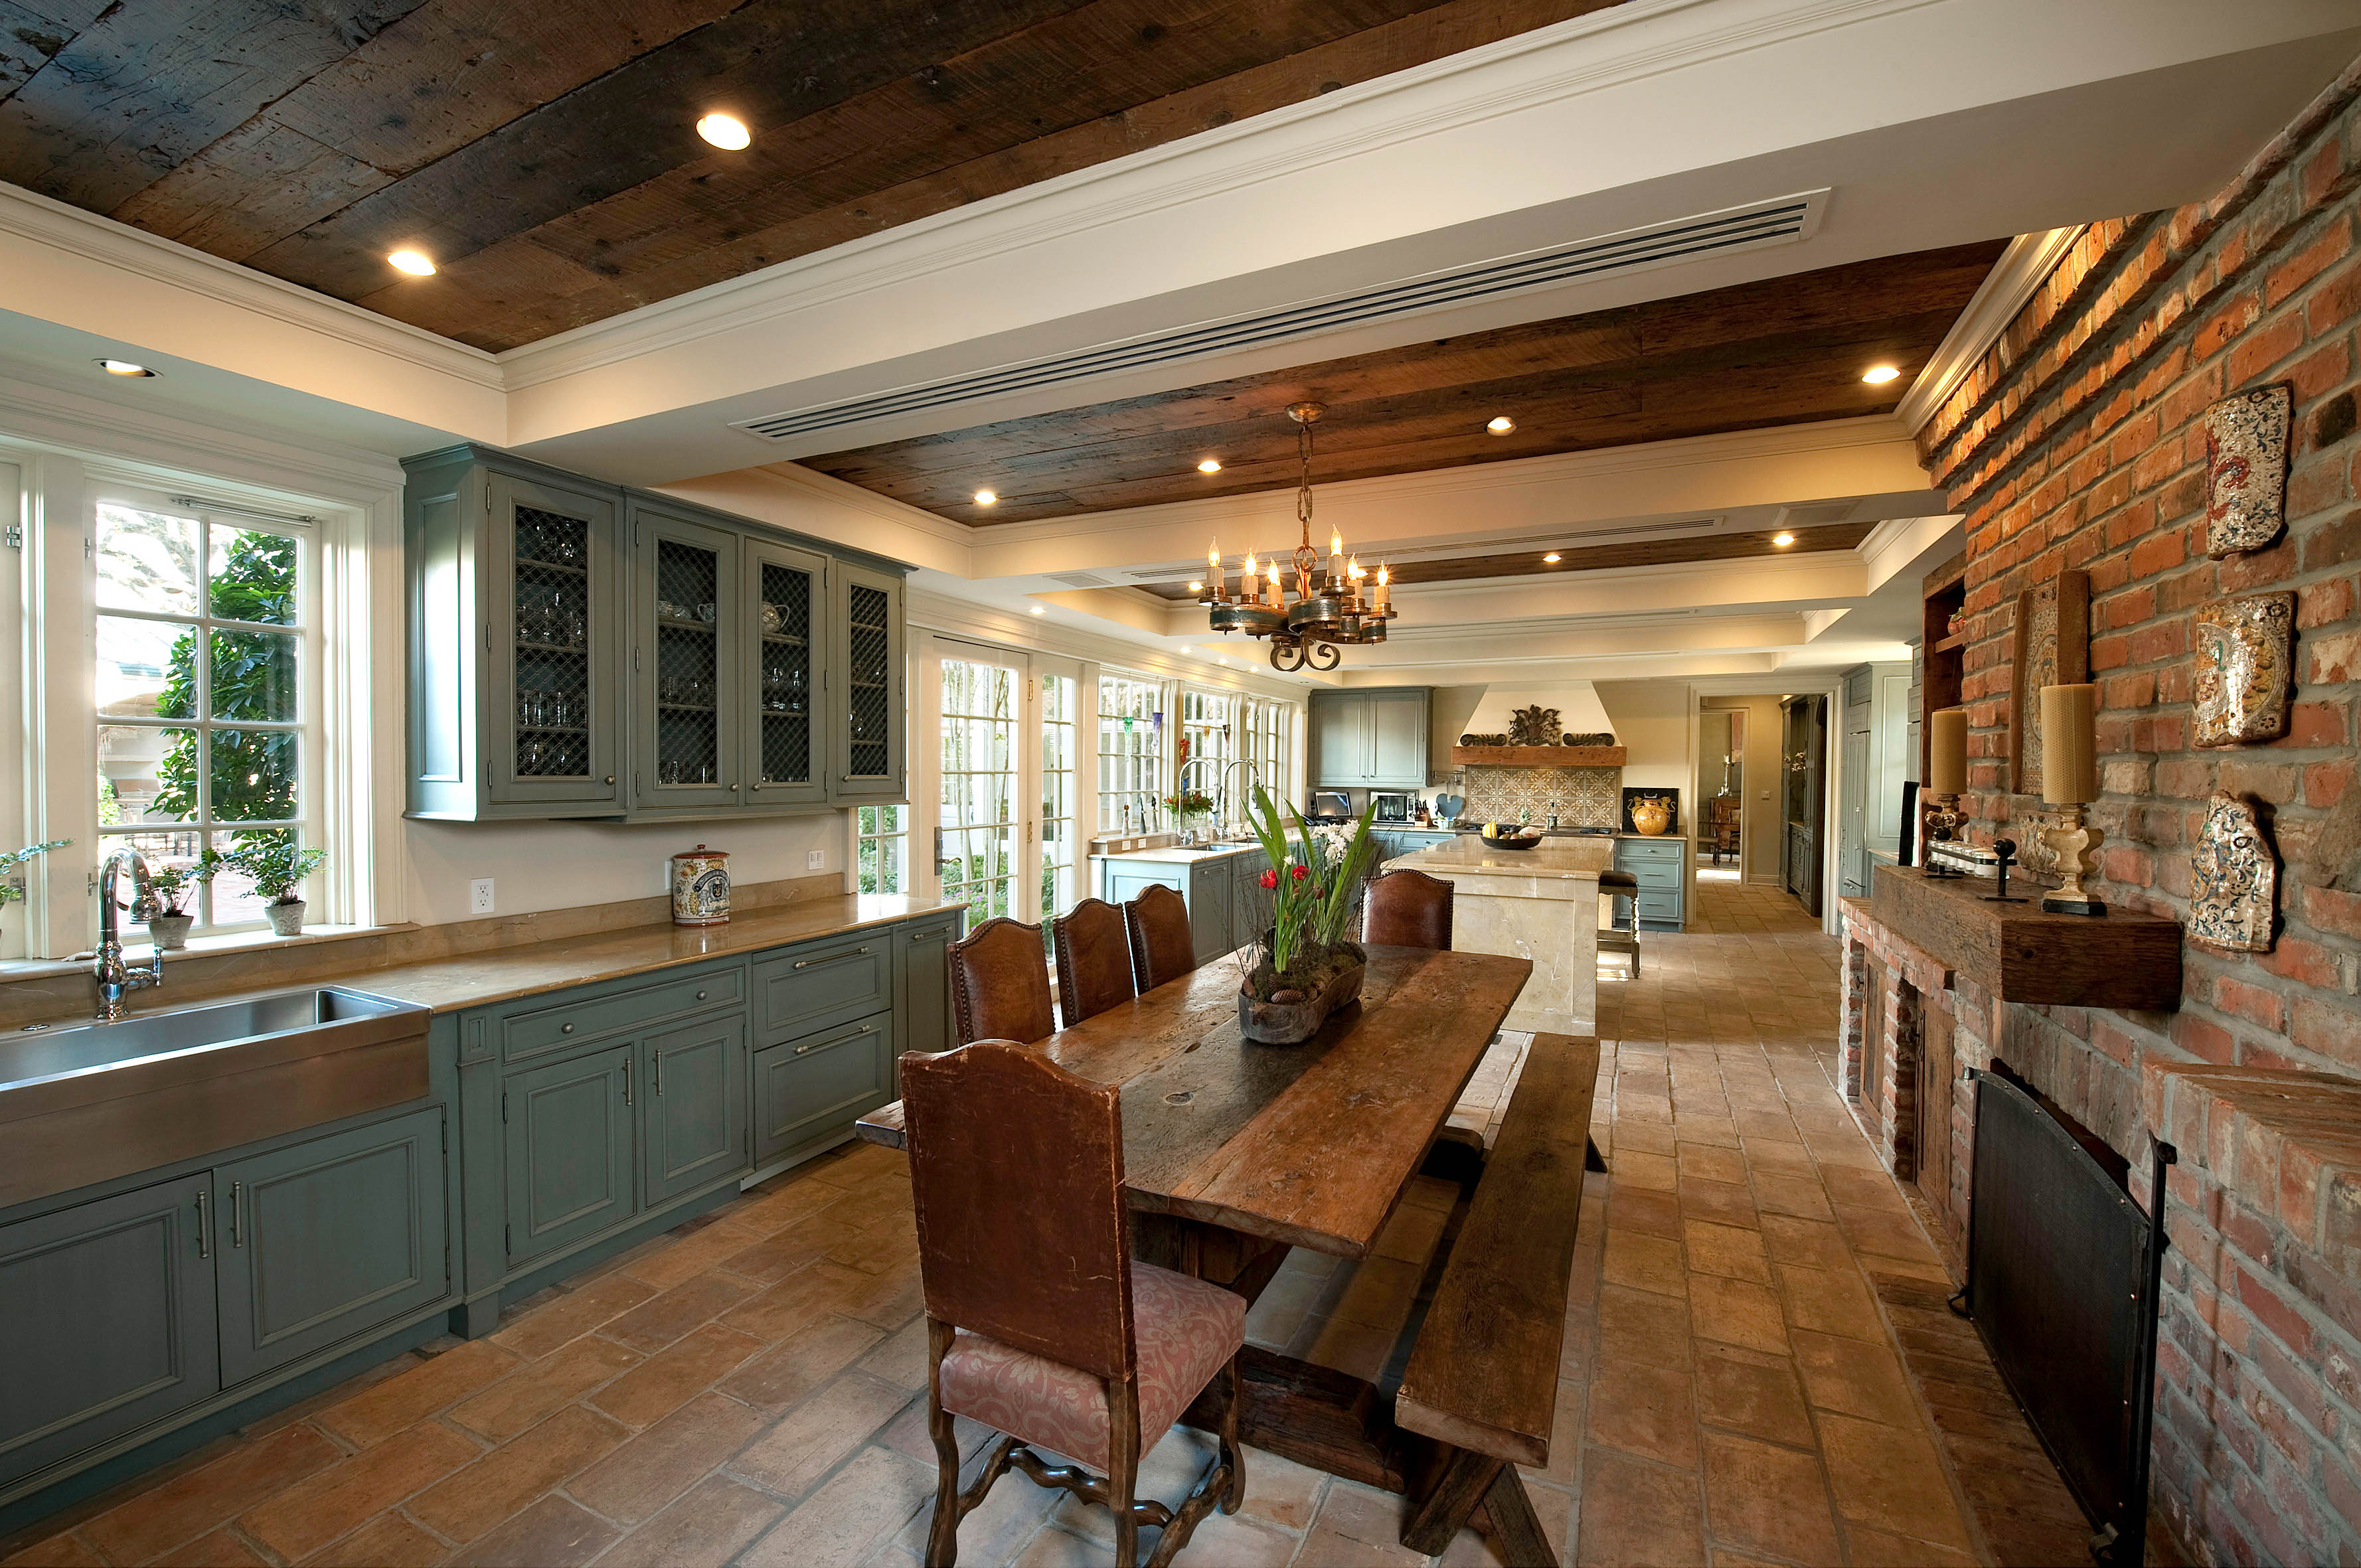 Old Metairie Kitchen_8753 105